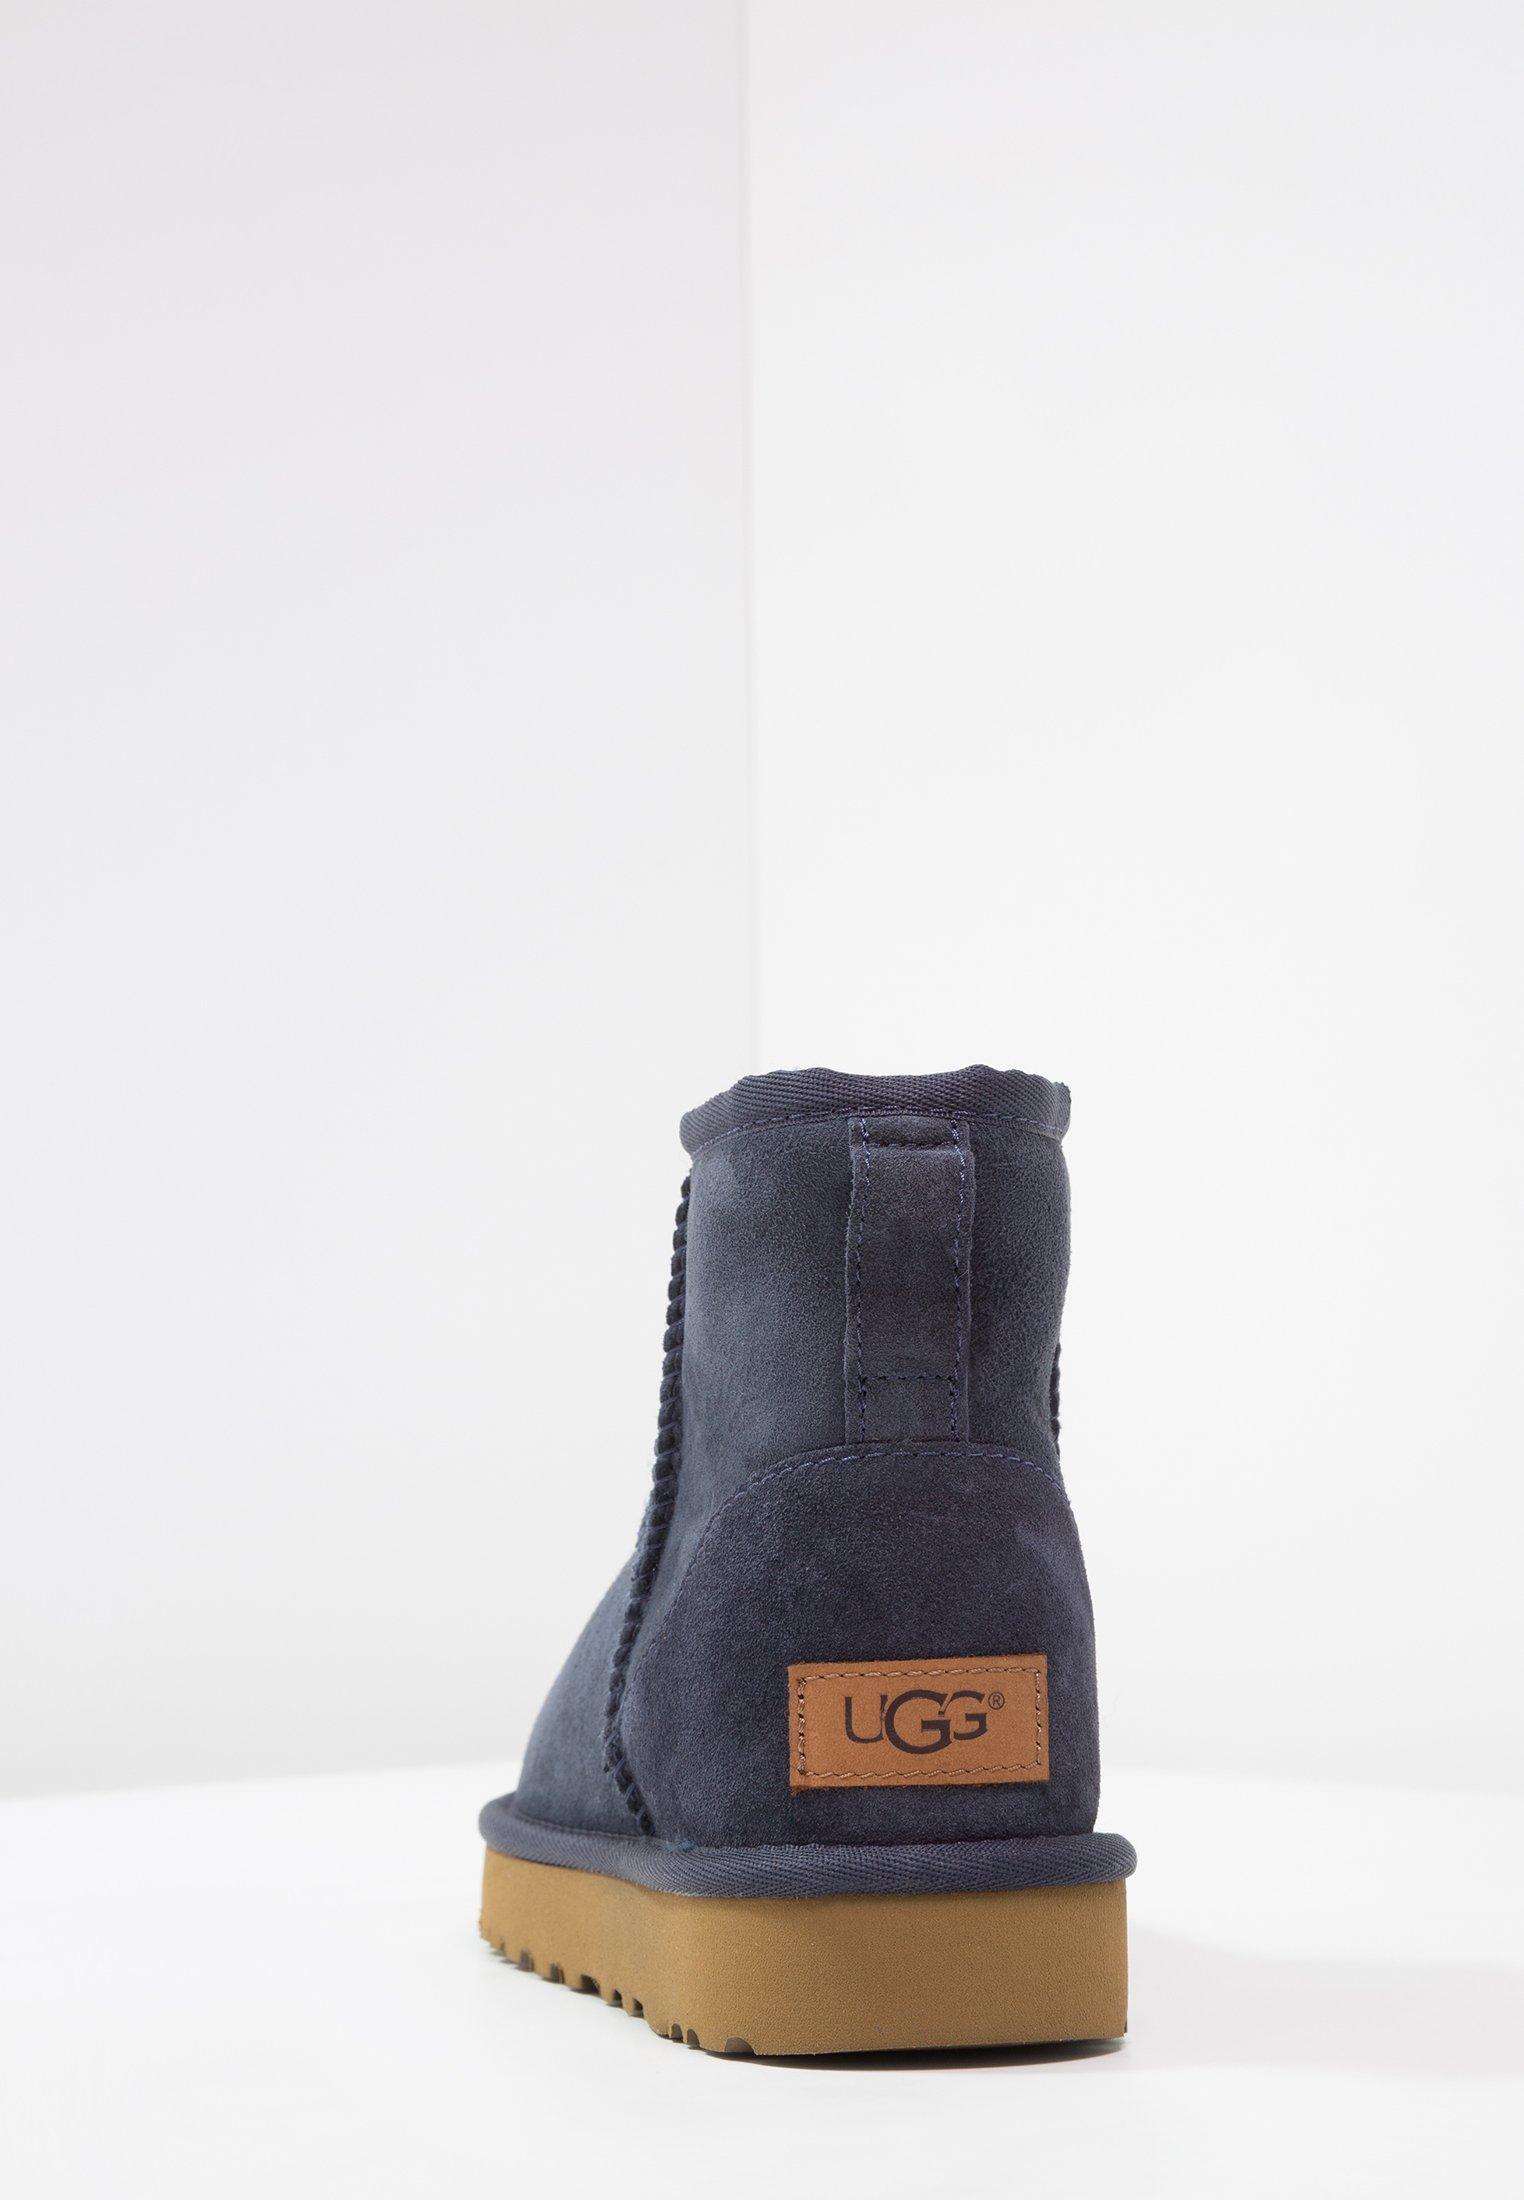 Ugg Classic Mini Ii - Stiefelette Navy/dunkelblau